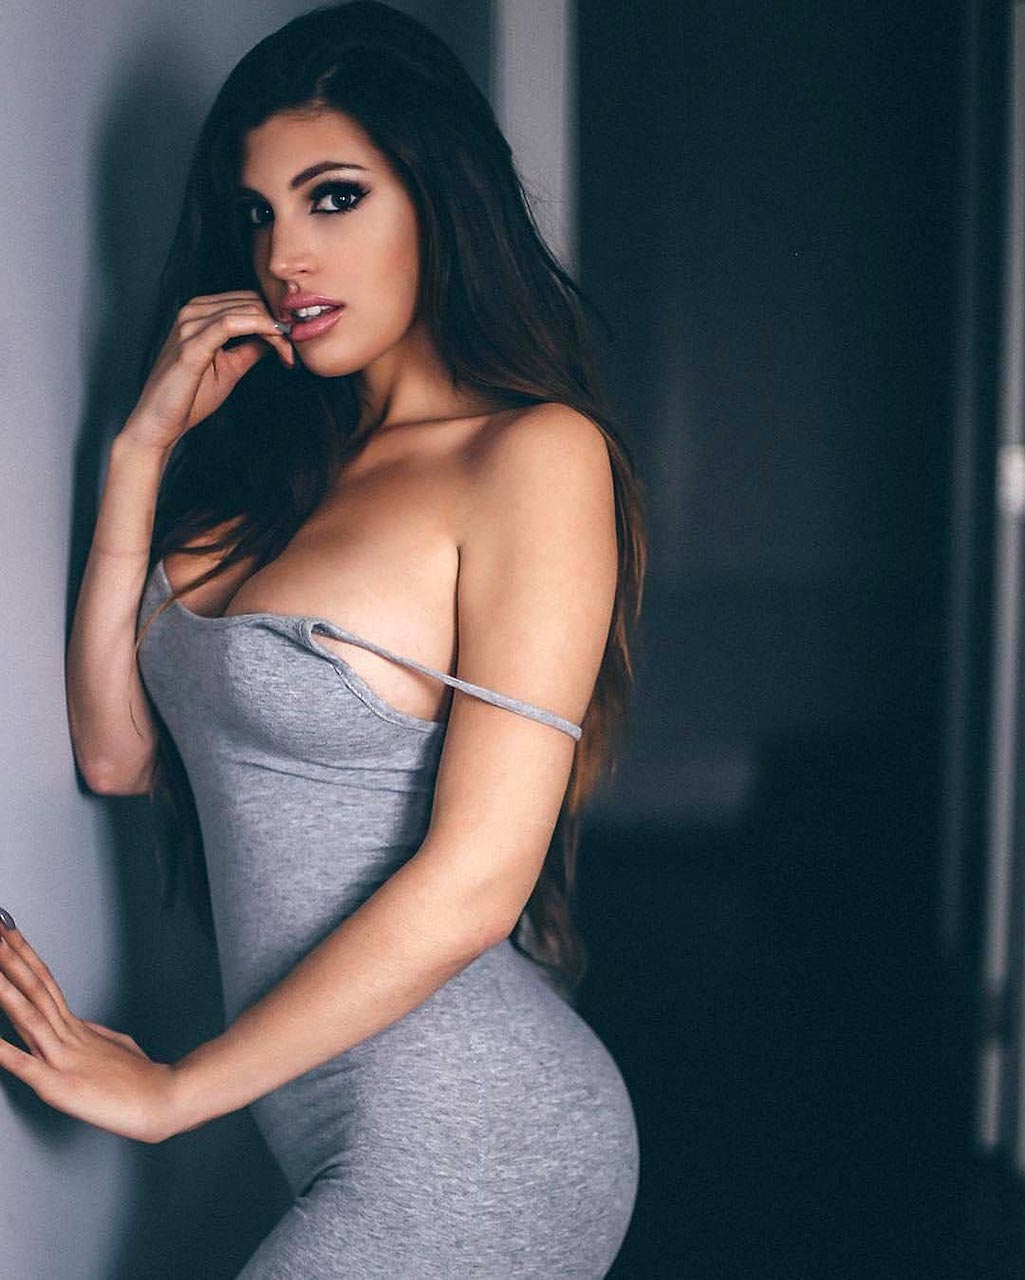 Rosana Hernandez Nude & Sexy Photos - Scandal Planet